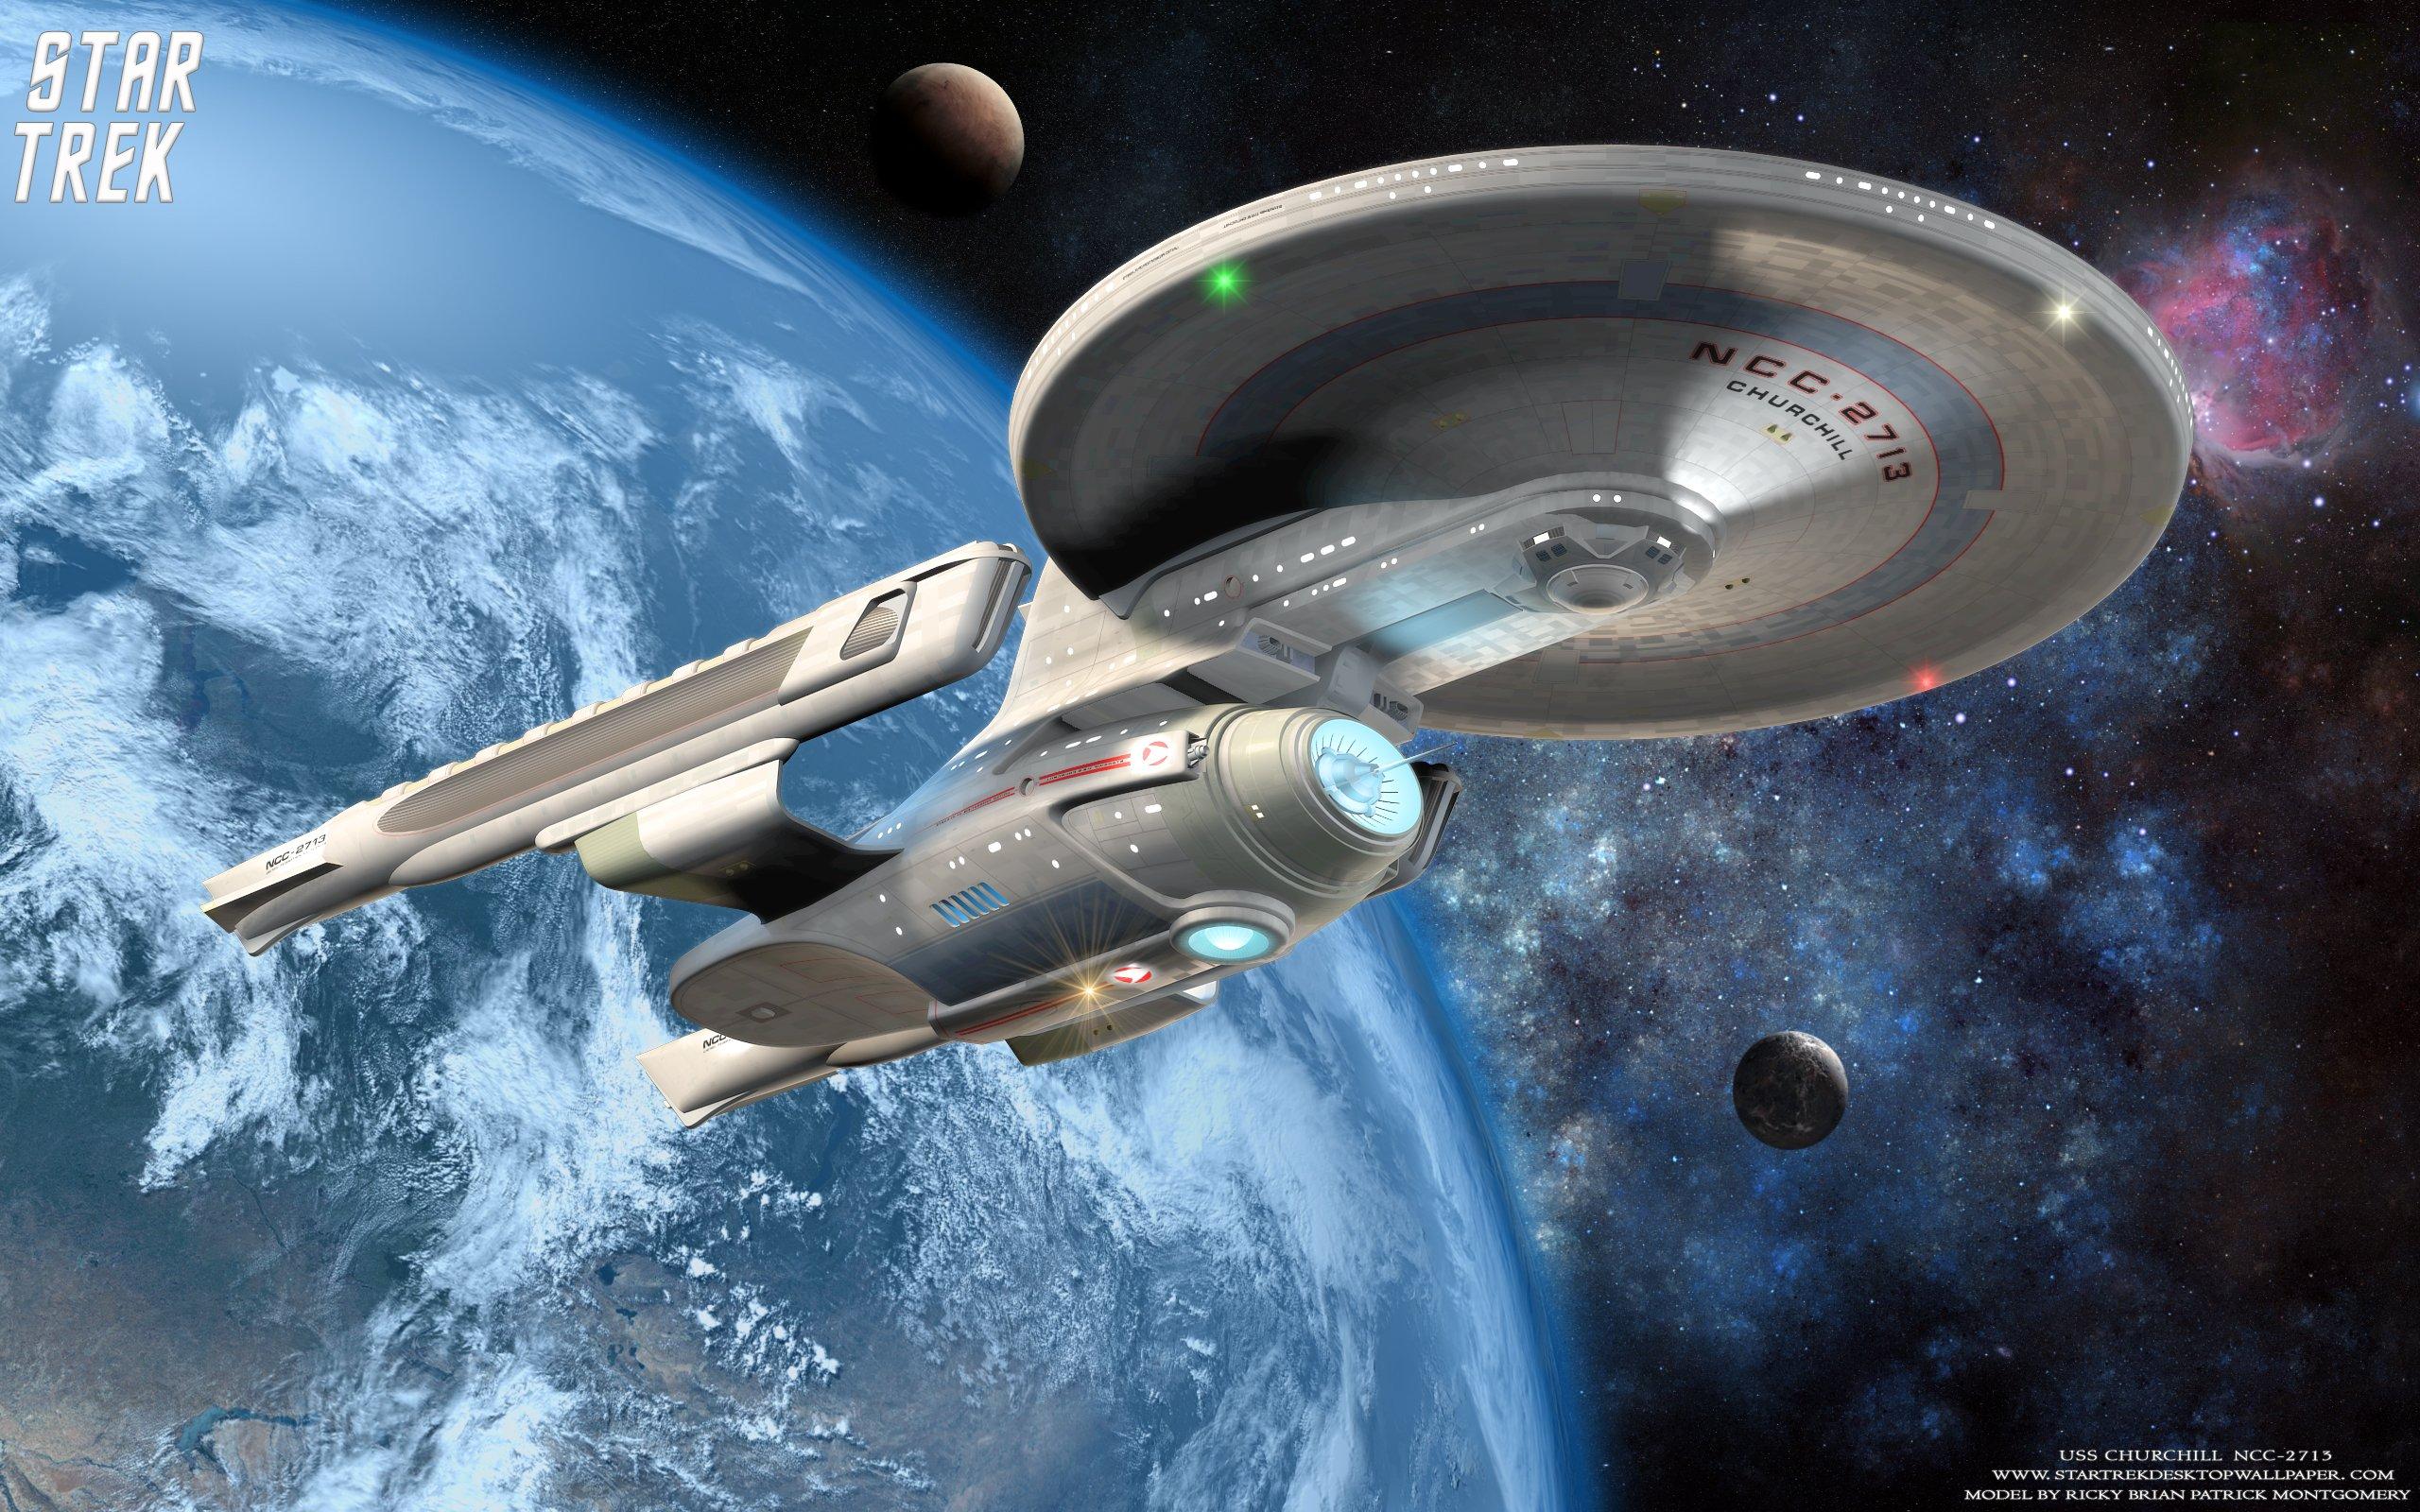 Star-Trek HD wallpaper